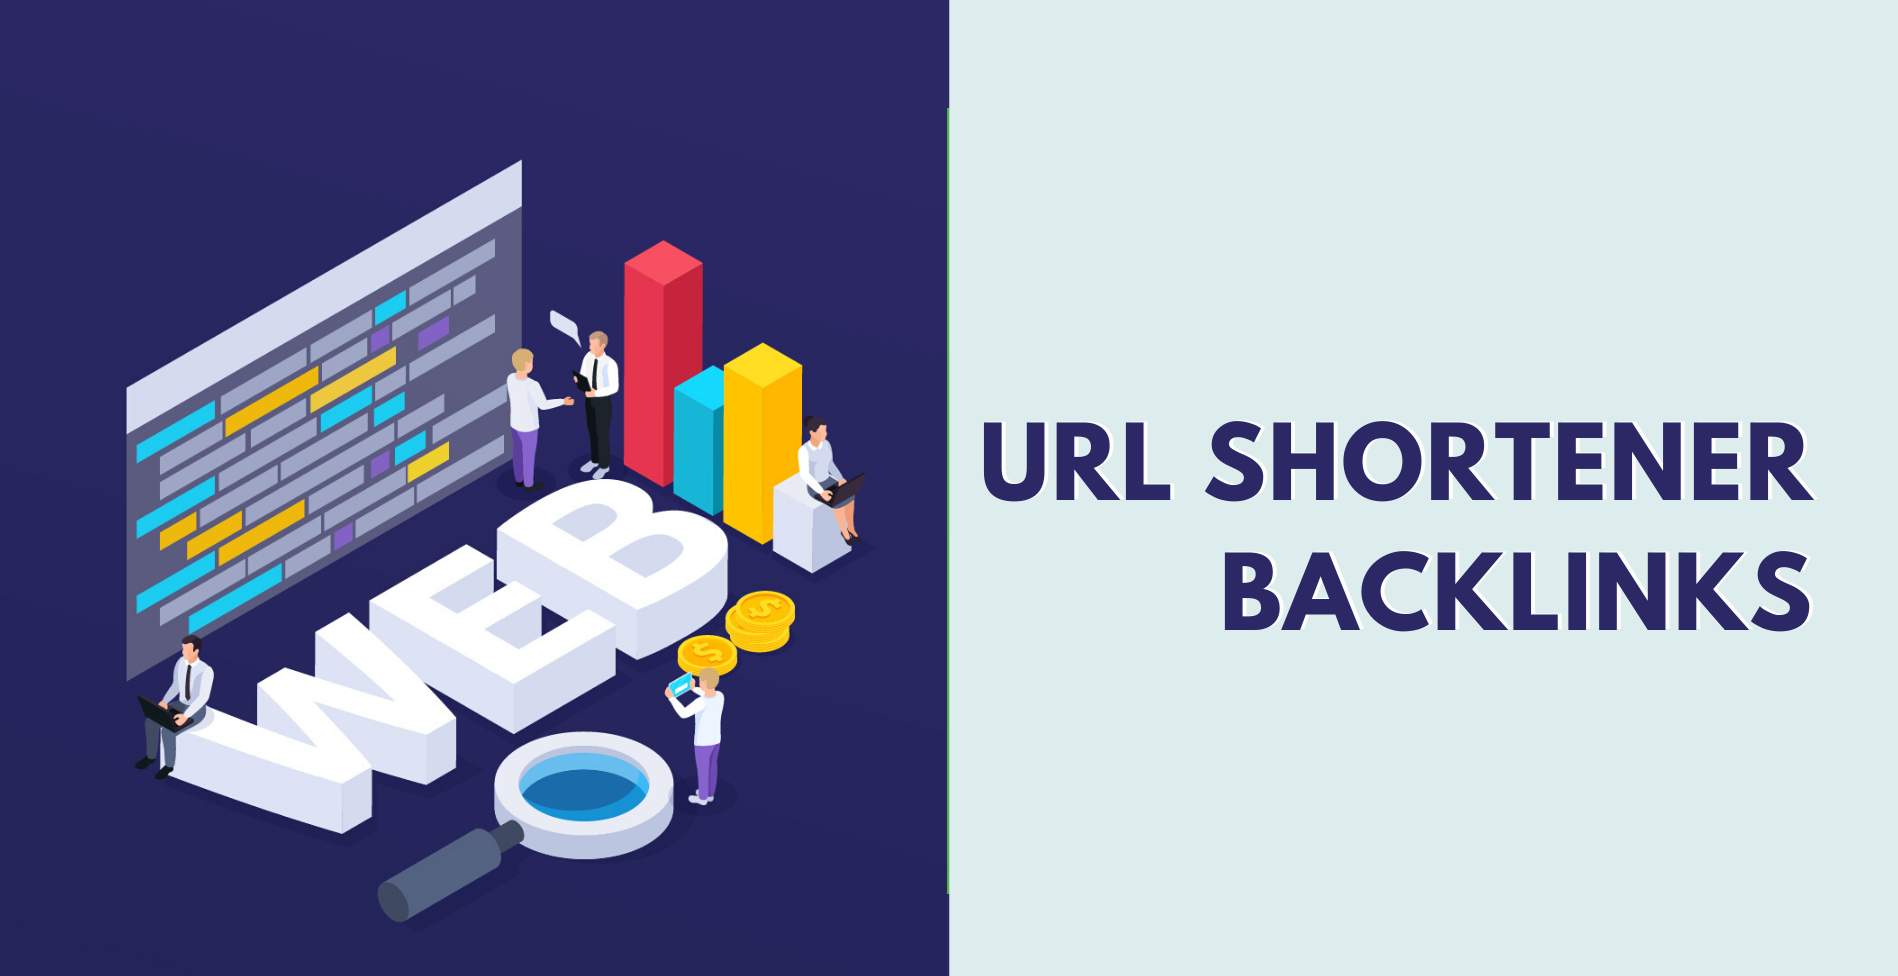 URL shortener backlinks Indexer